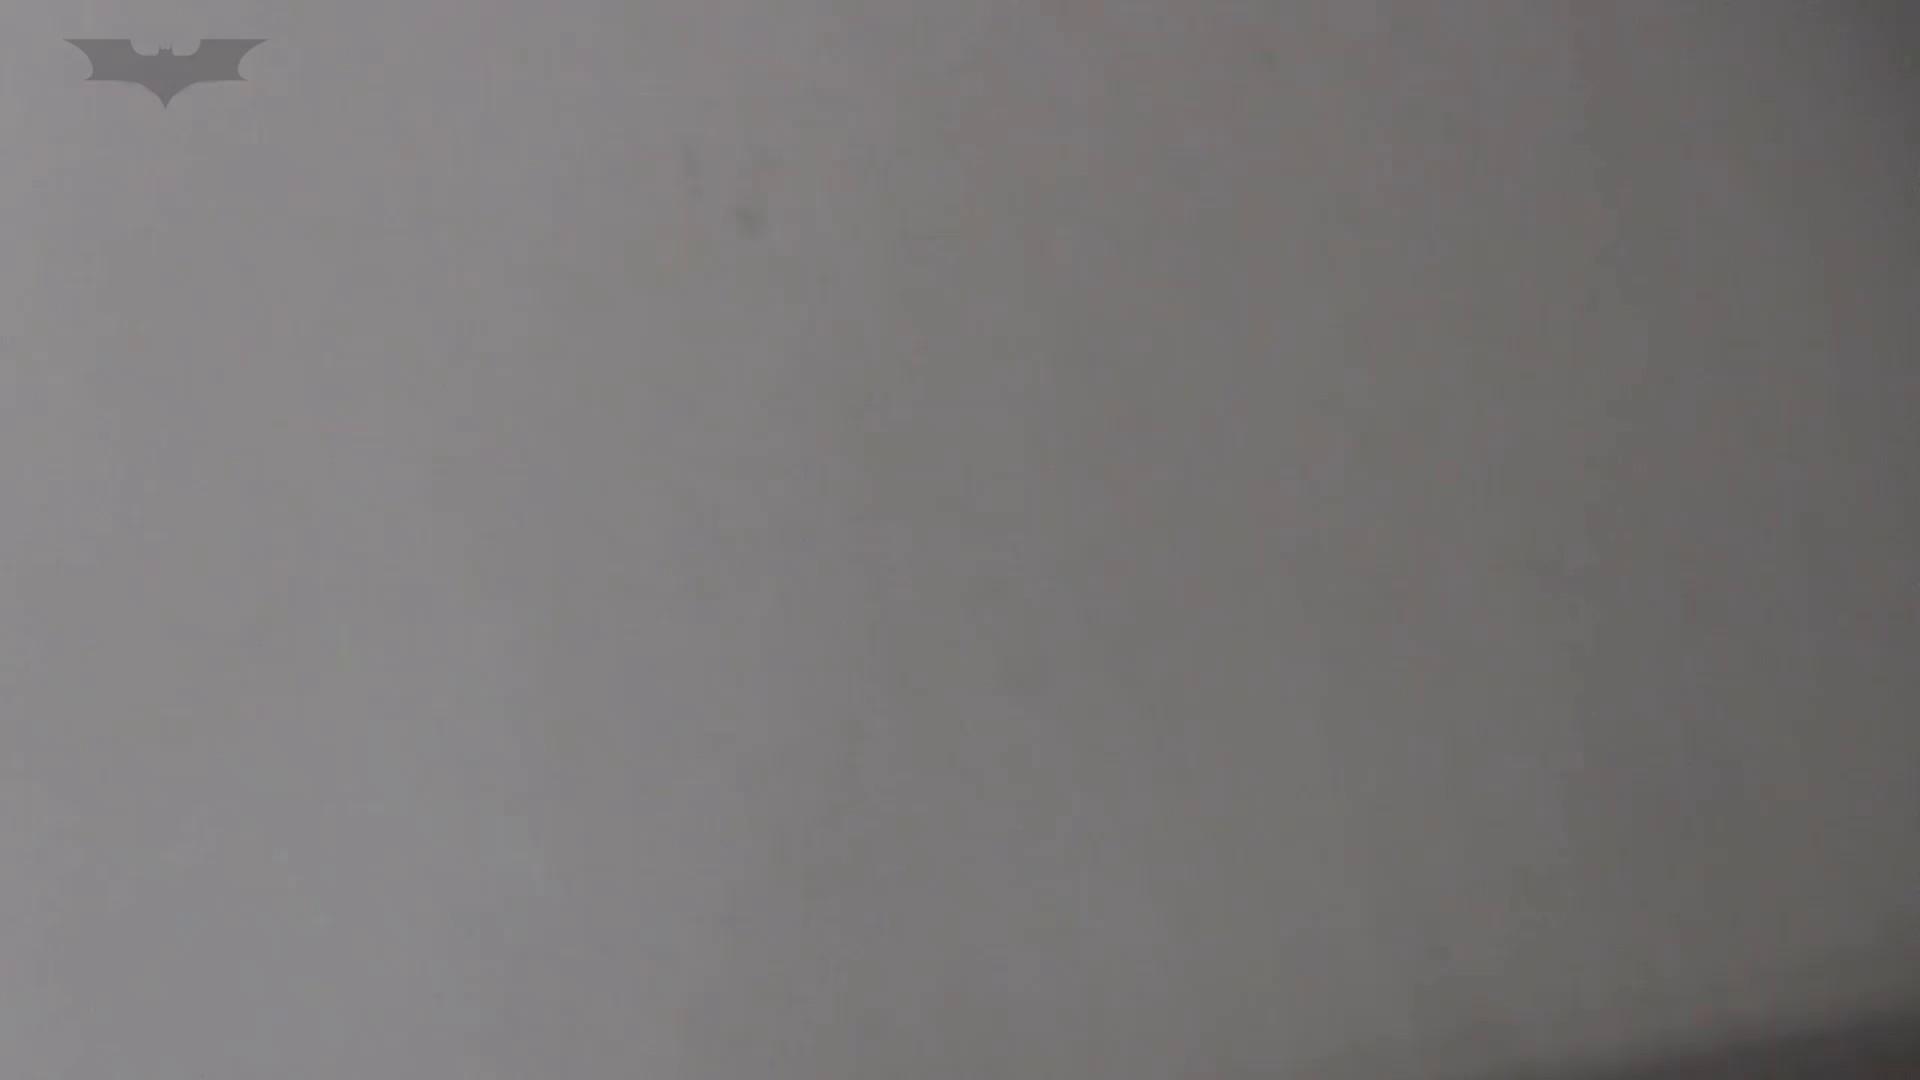 JD盗撮 美女の洗面所の秘密 Vol.28 OLのボディ | 美女のボディ  55PIX 26